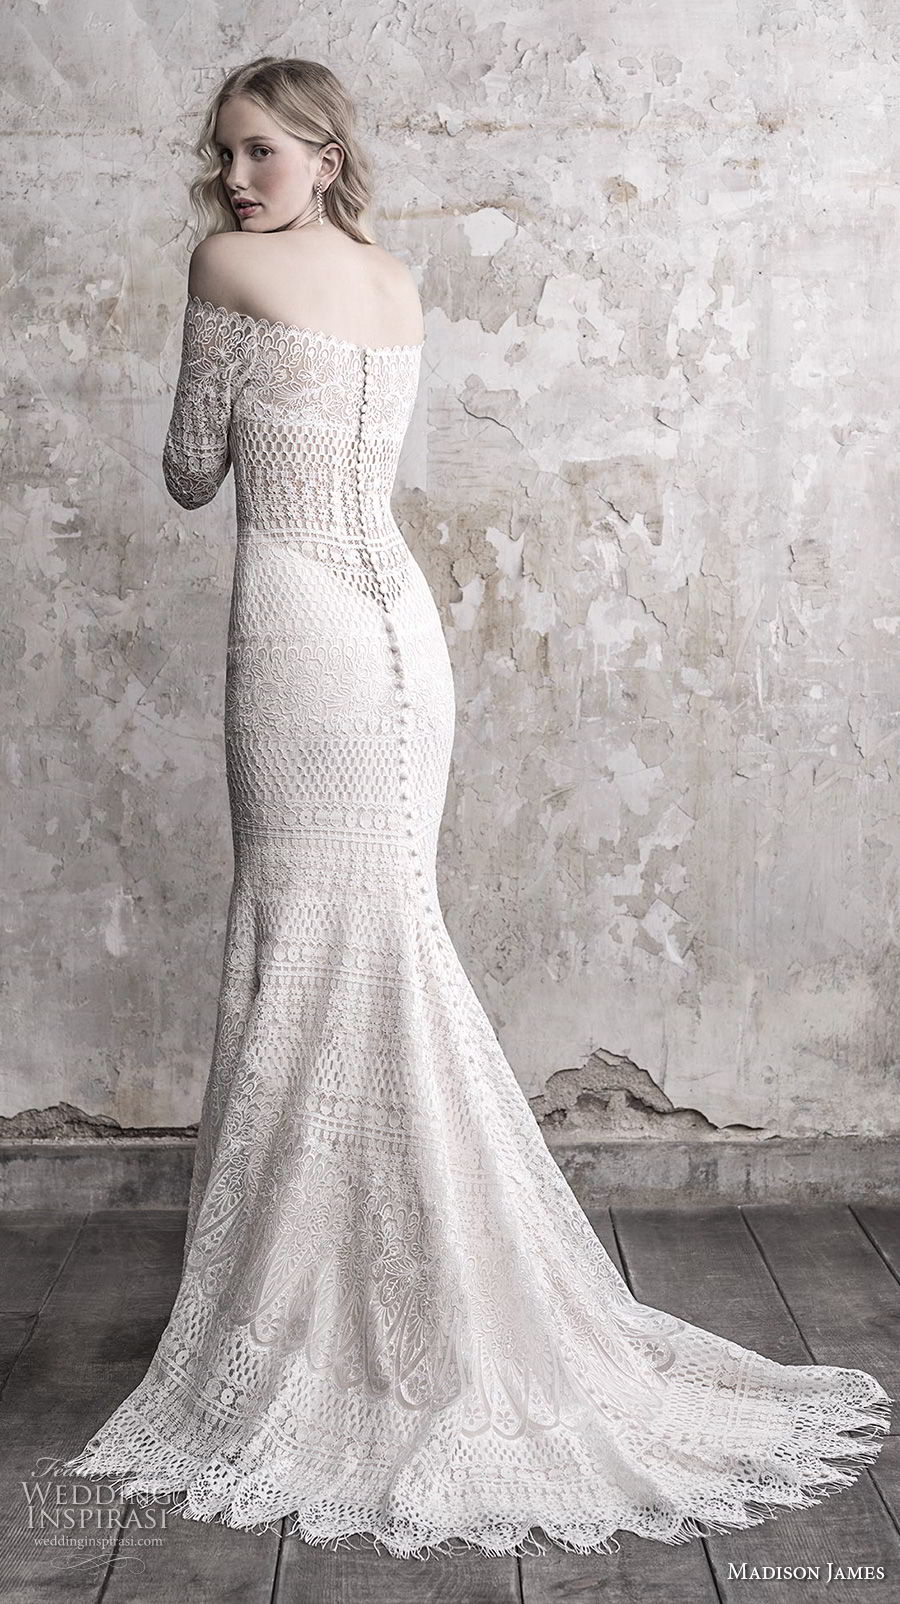 madison james fall 2018 bridal three quarter sleeves off the shoulder full embellishment elegant vintage fit and flare sheath wedding dress lace back sweep train (1) bv